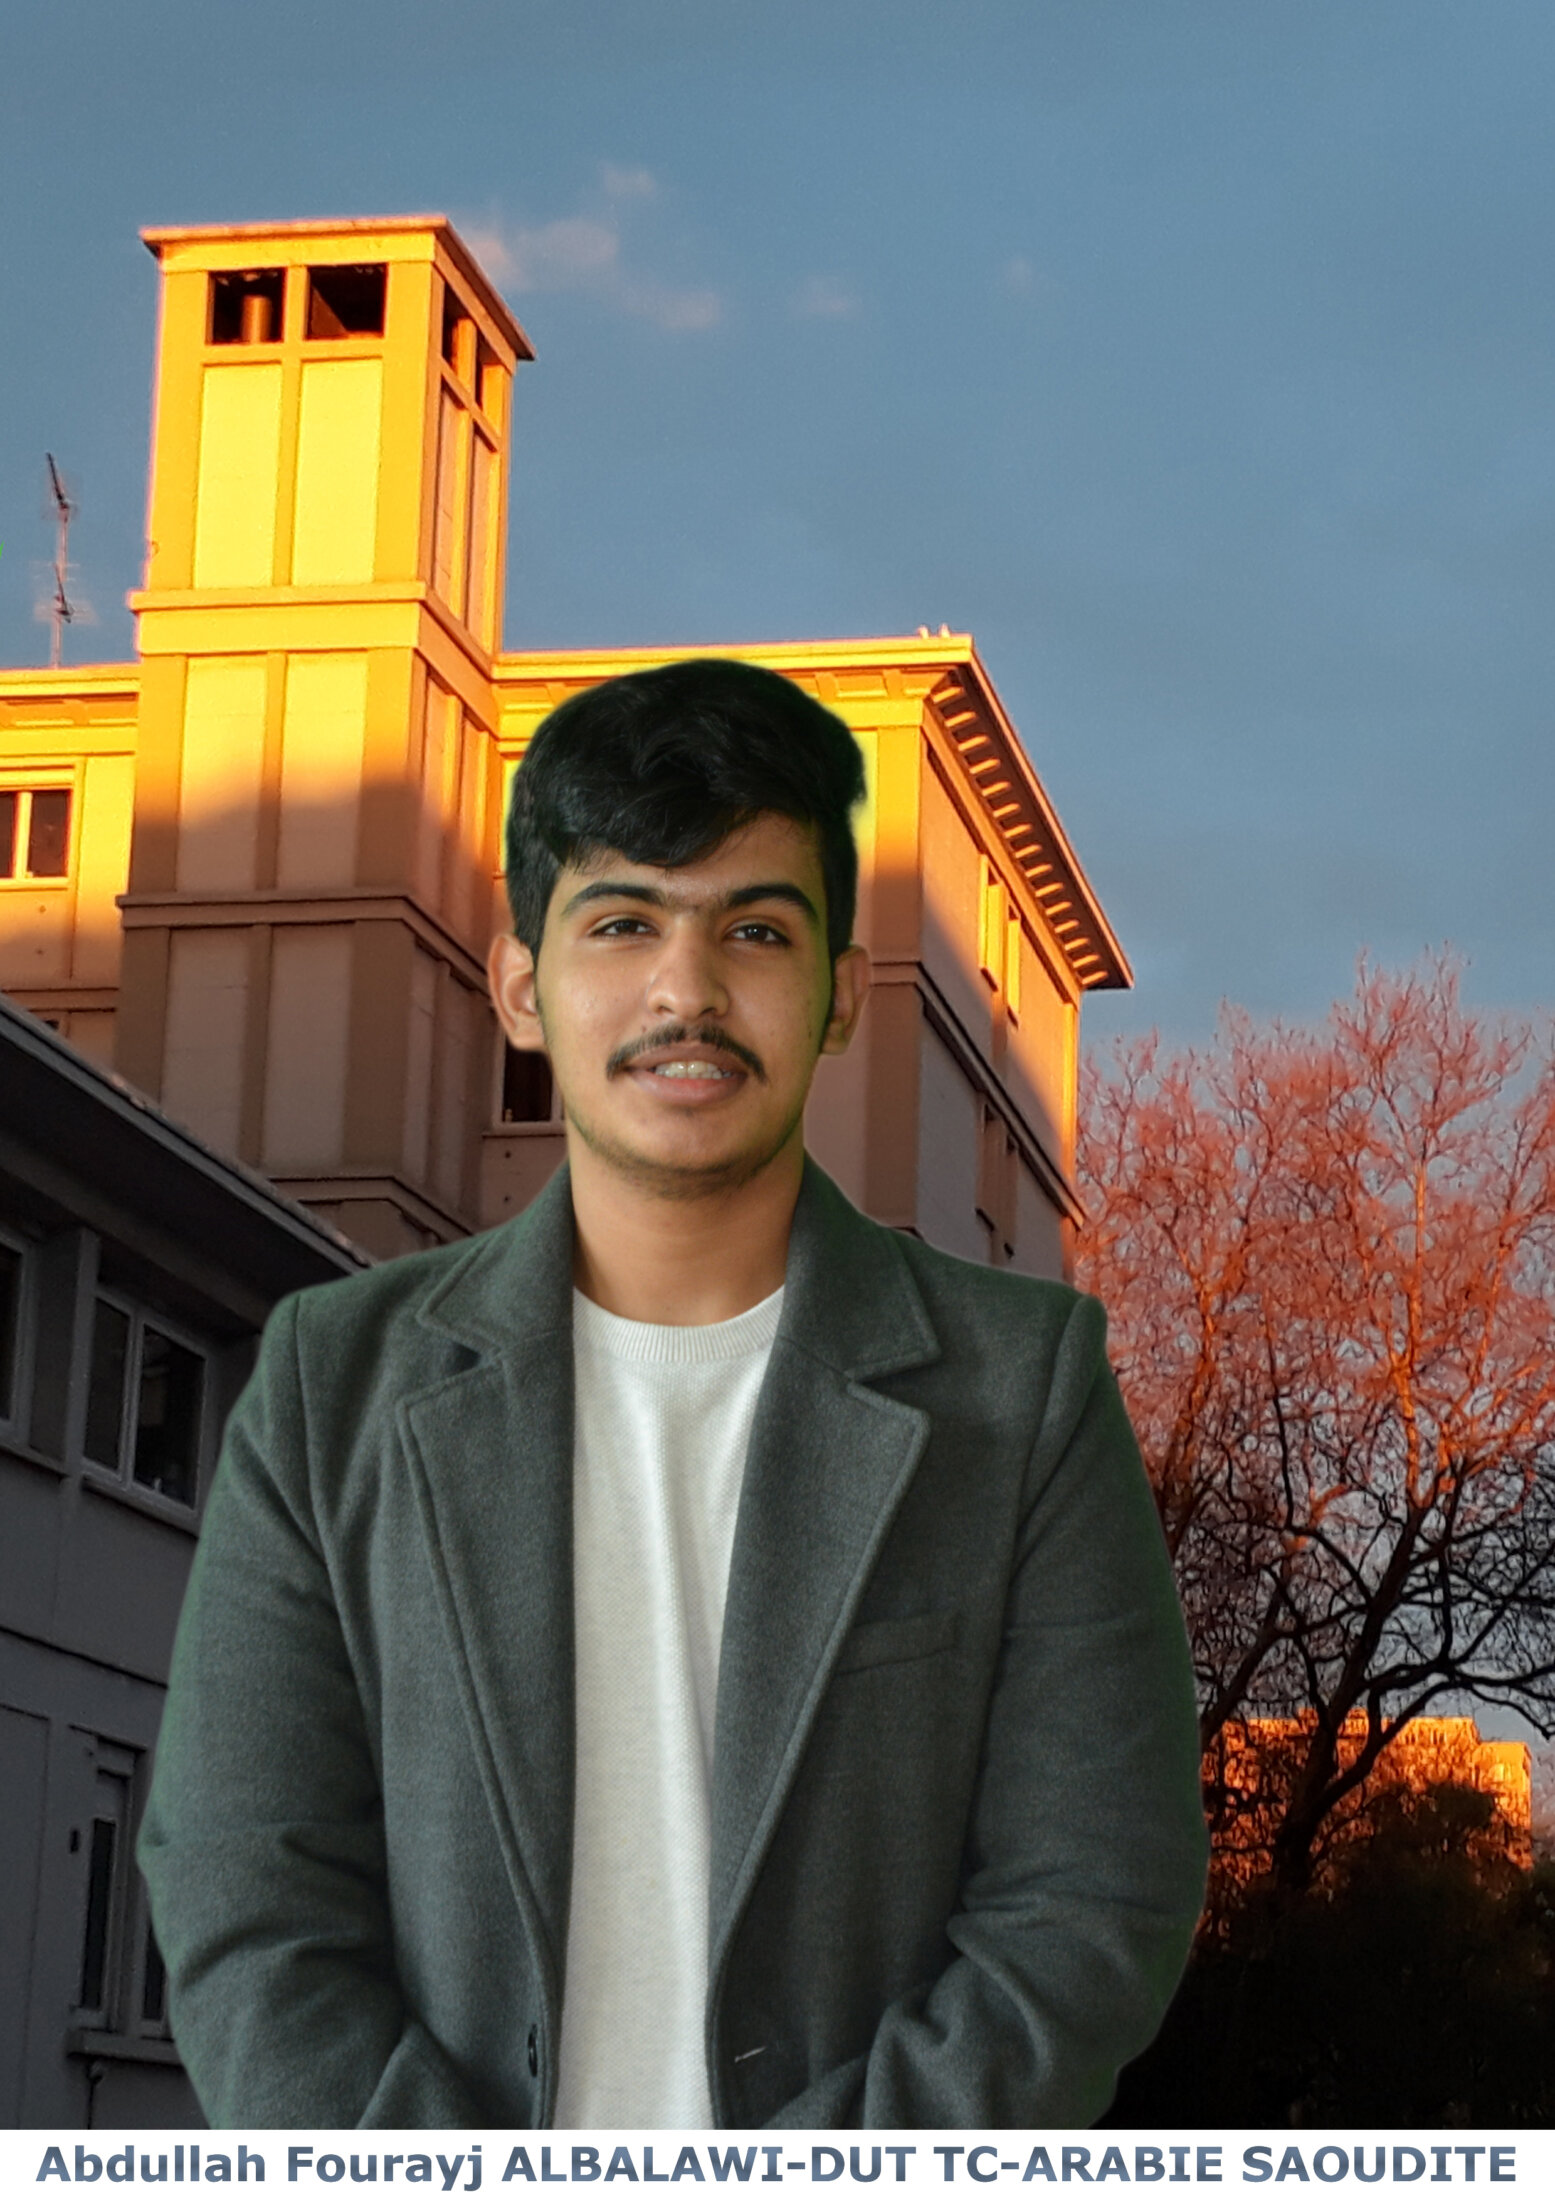 Abdullah Fourayj ALBALAWI - DUT TC - ARABIE SAOUDITE